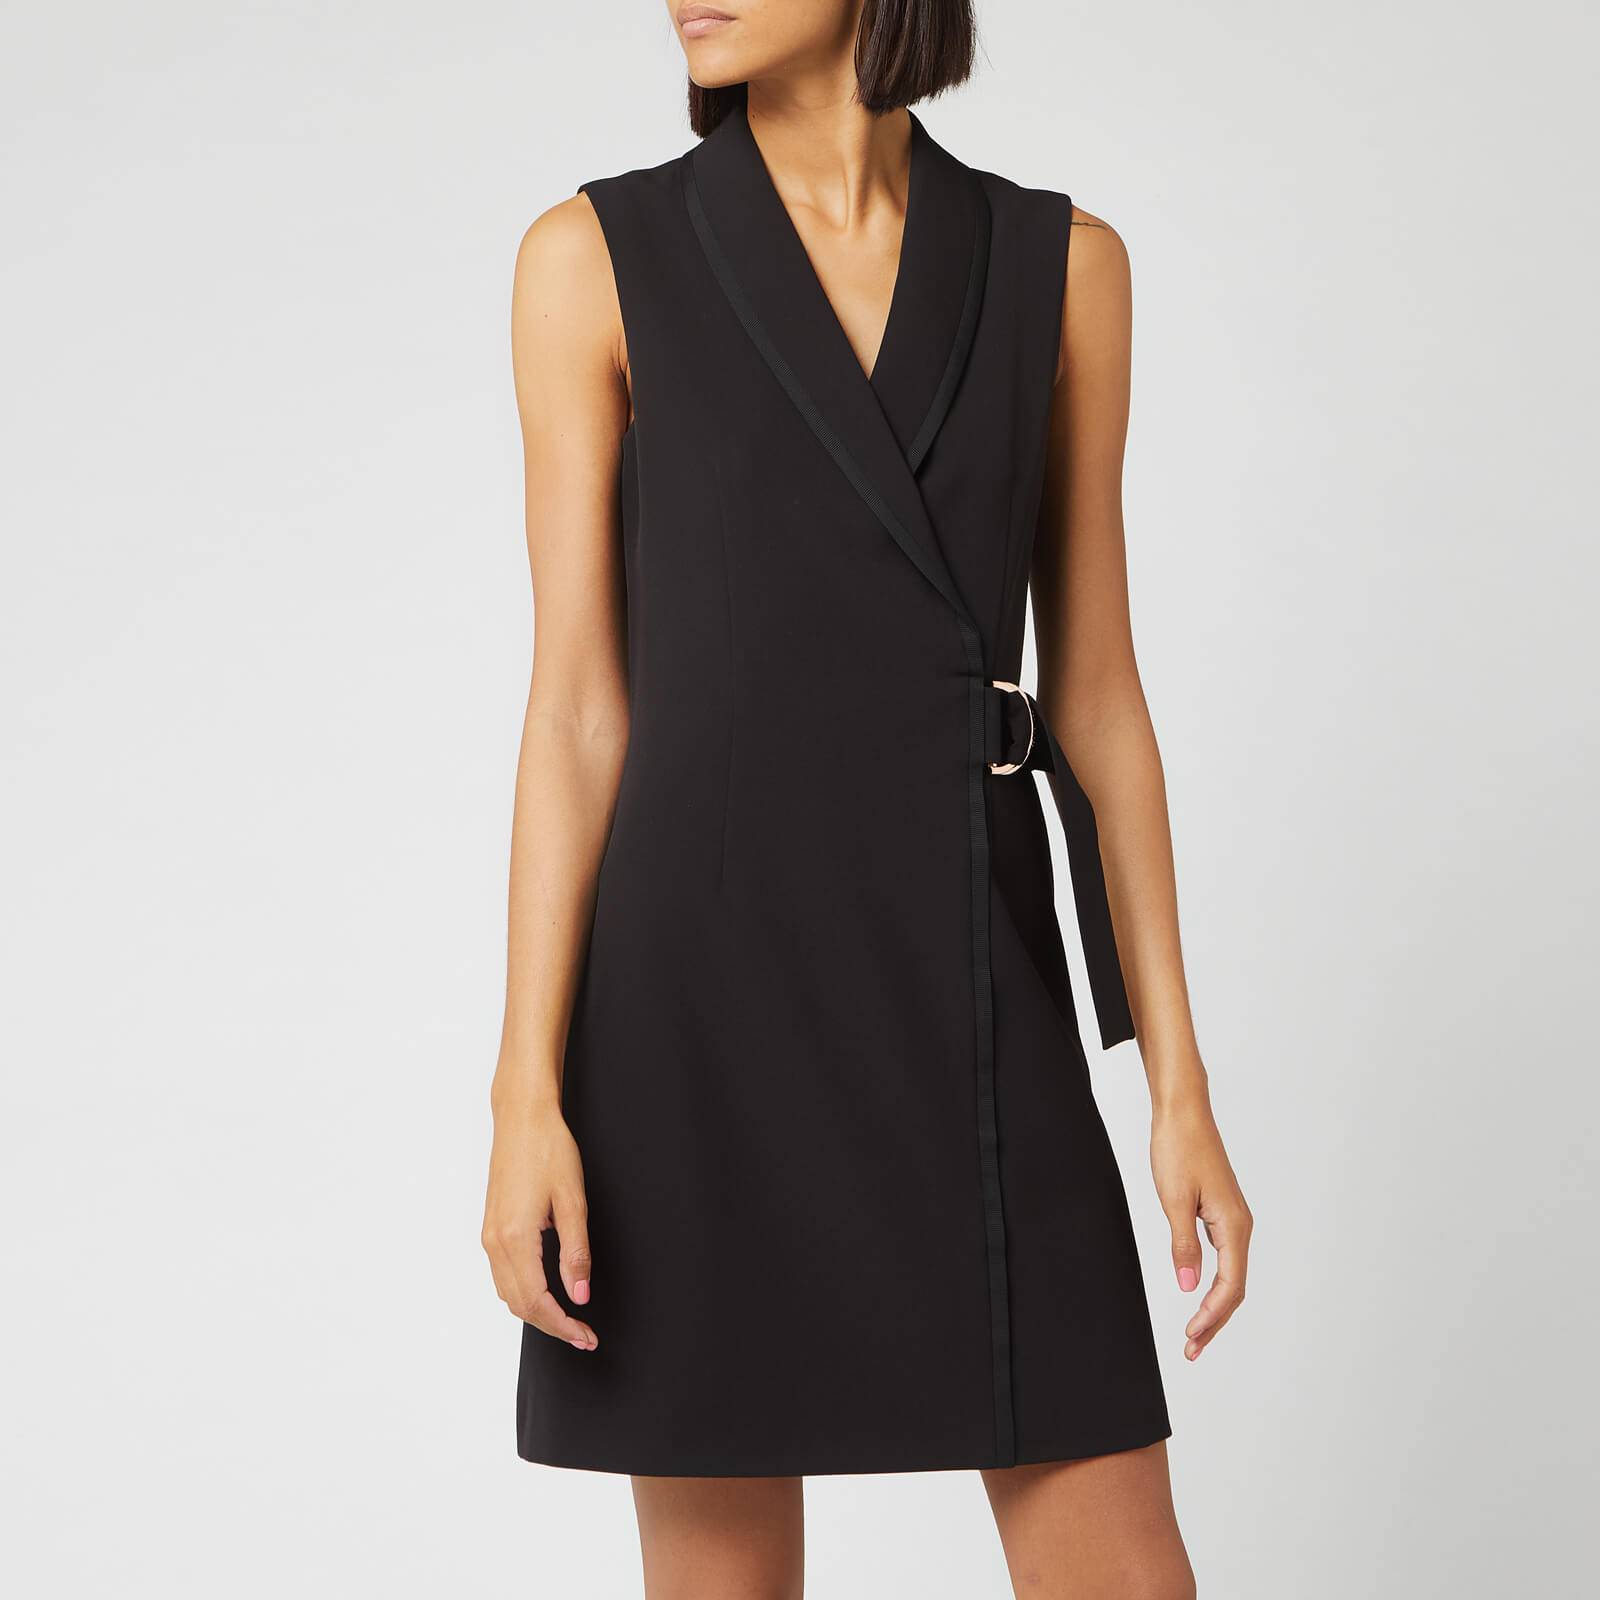 Ted Baker Women's Adaard Ring Tailored Dress - Black - 2/UK 10 - Black